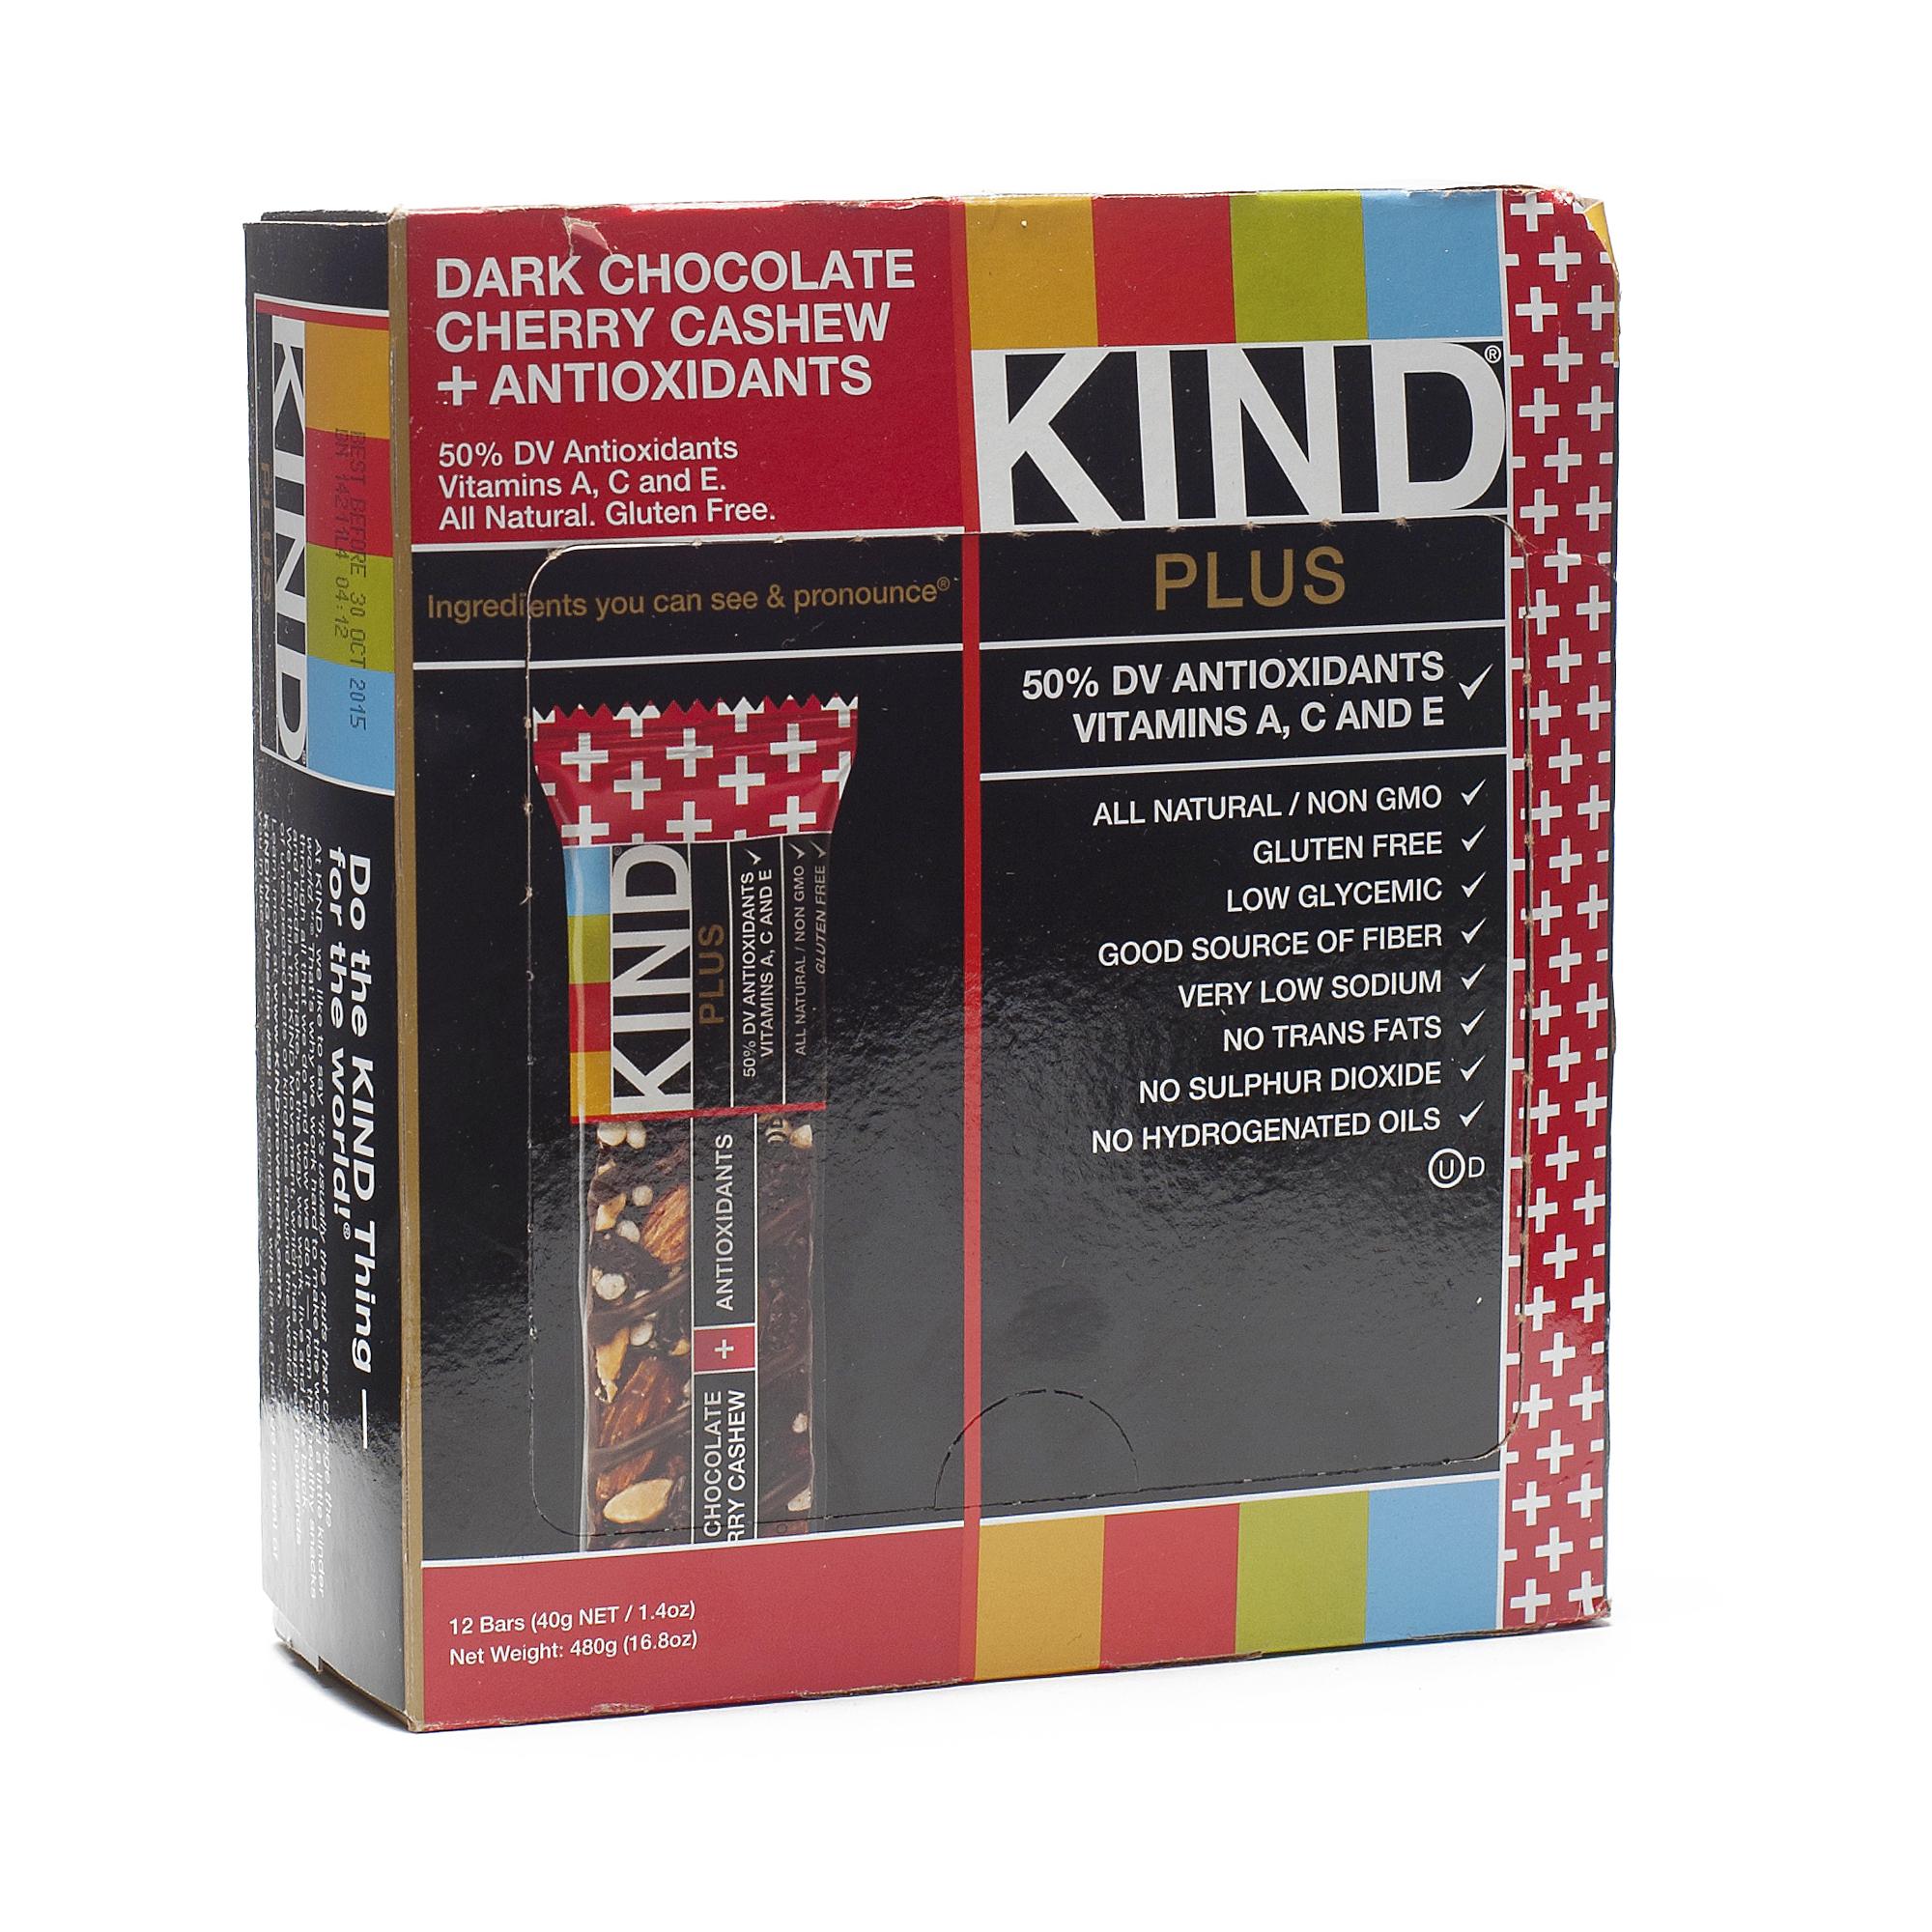 KIND Chocolate Cherries & Cashew Bar with Antioxidants